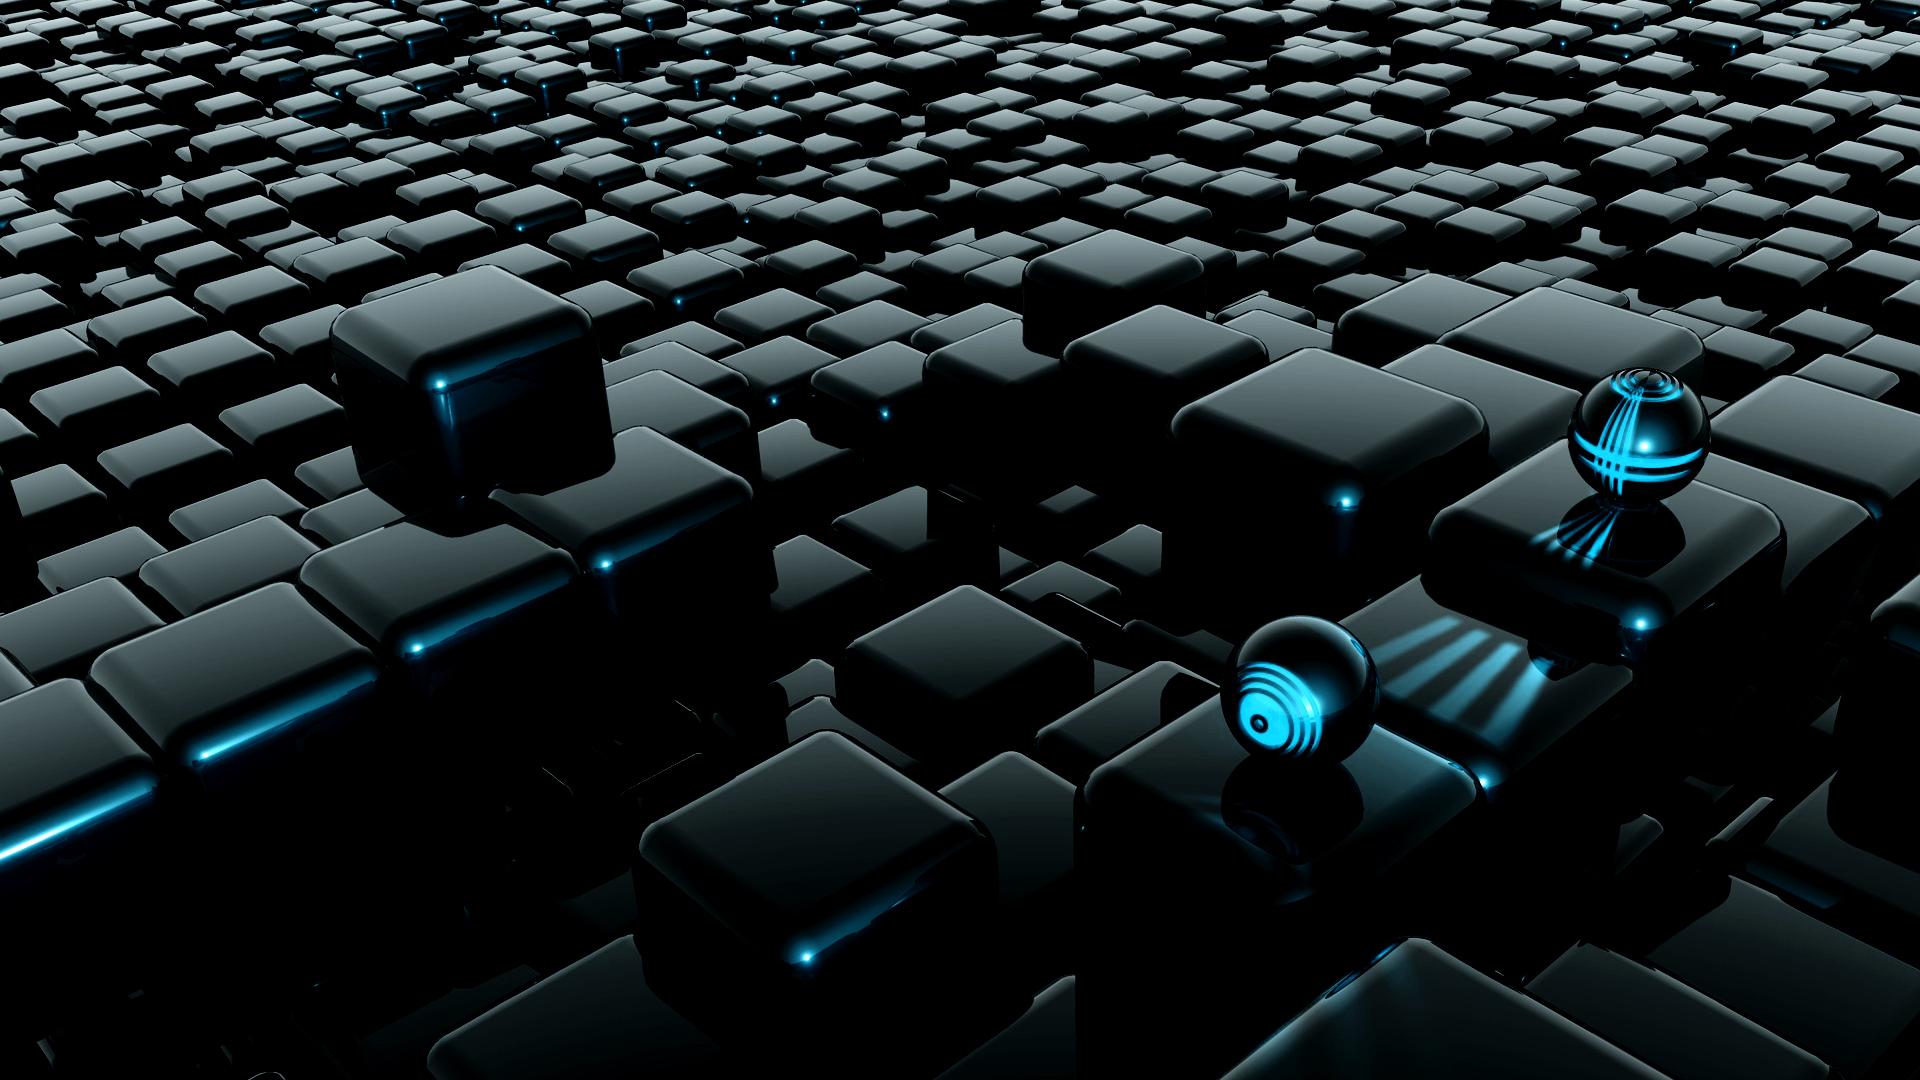 Blue Tiles Wallpaper 1920x1080 Blue Tiles Last One Believe Will 1920x1080